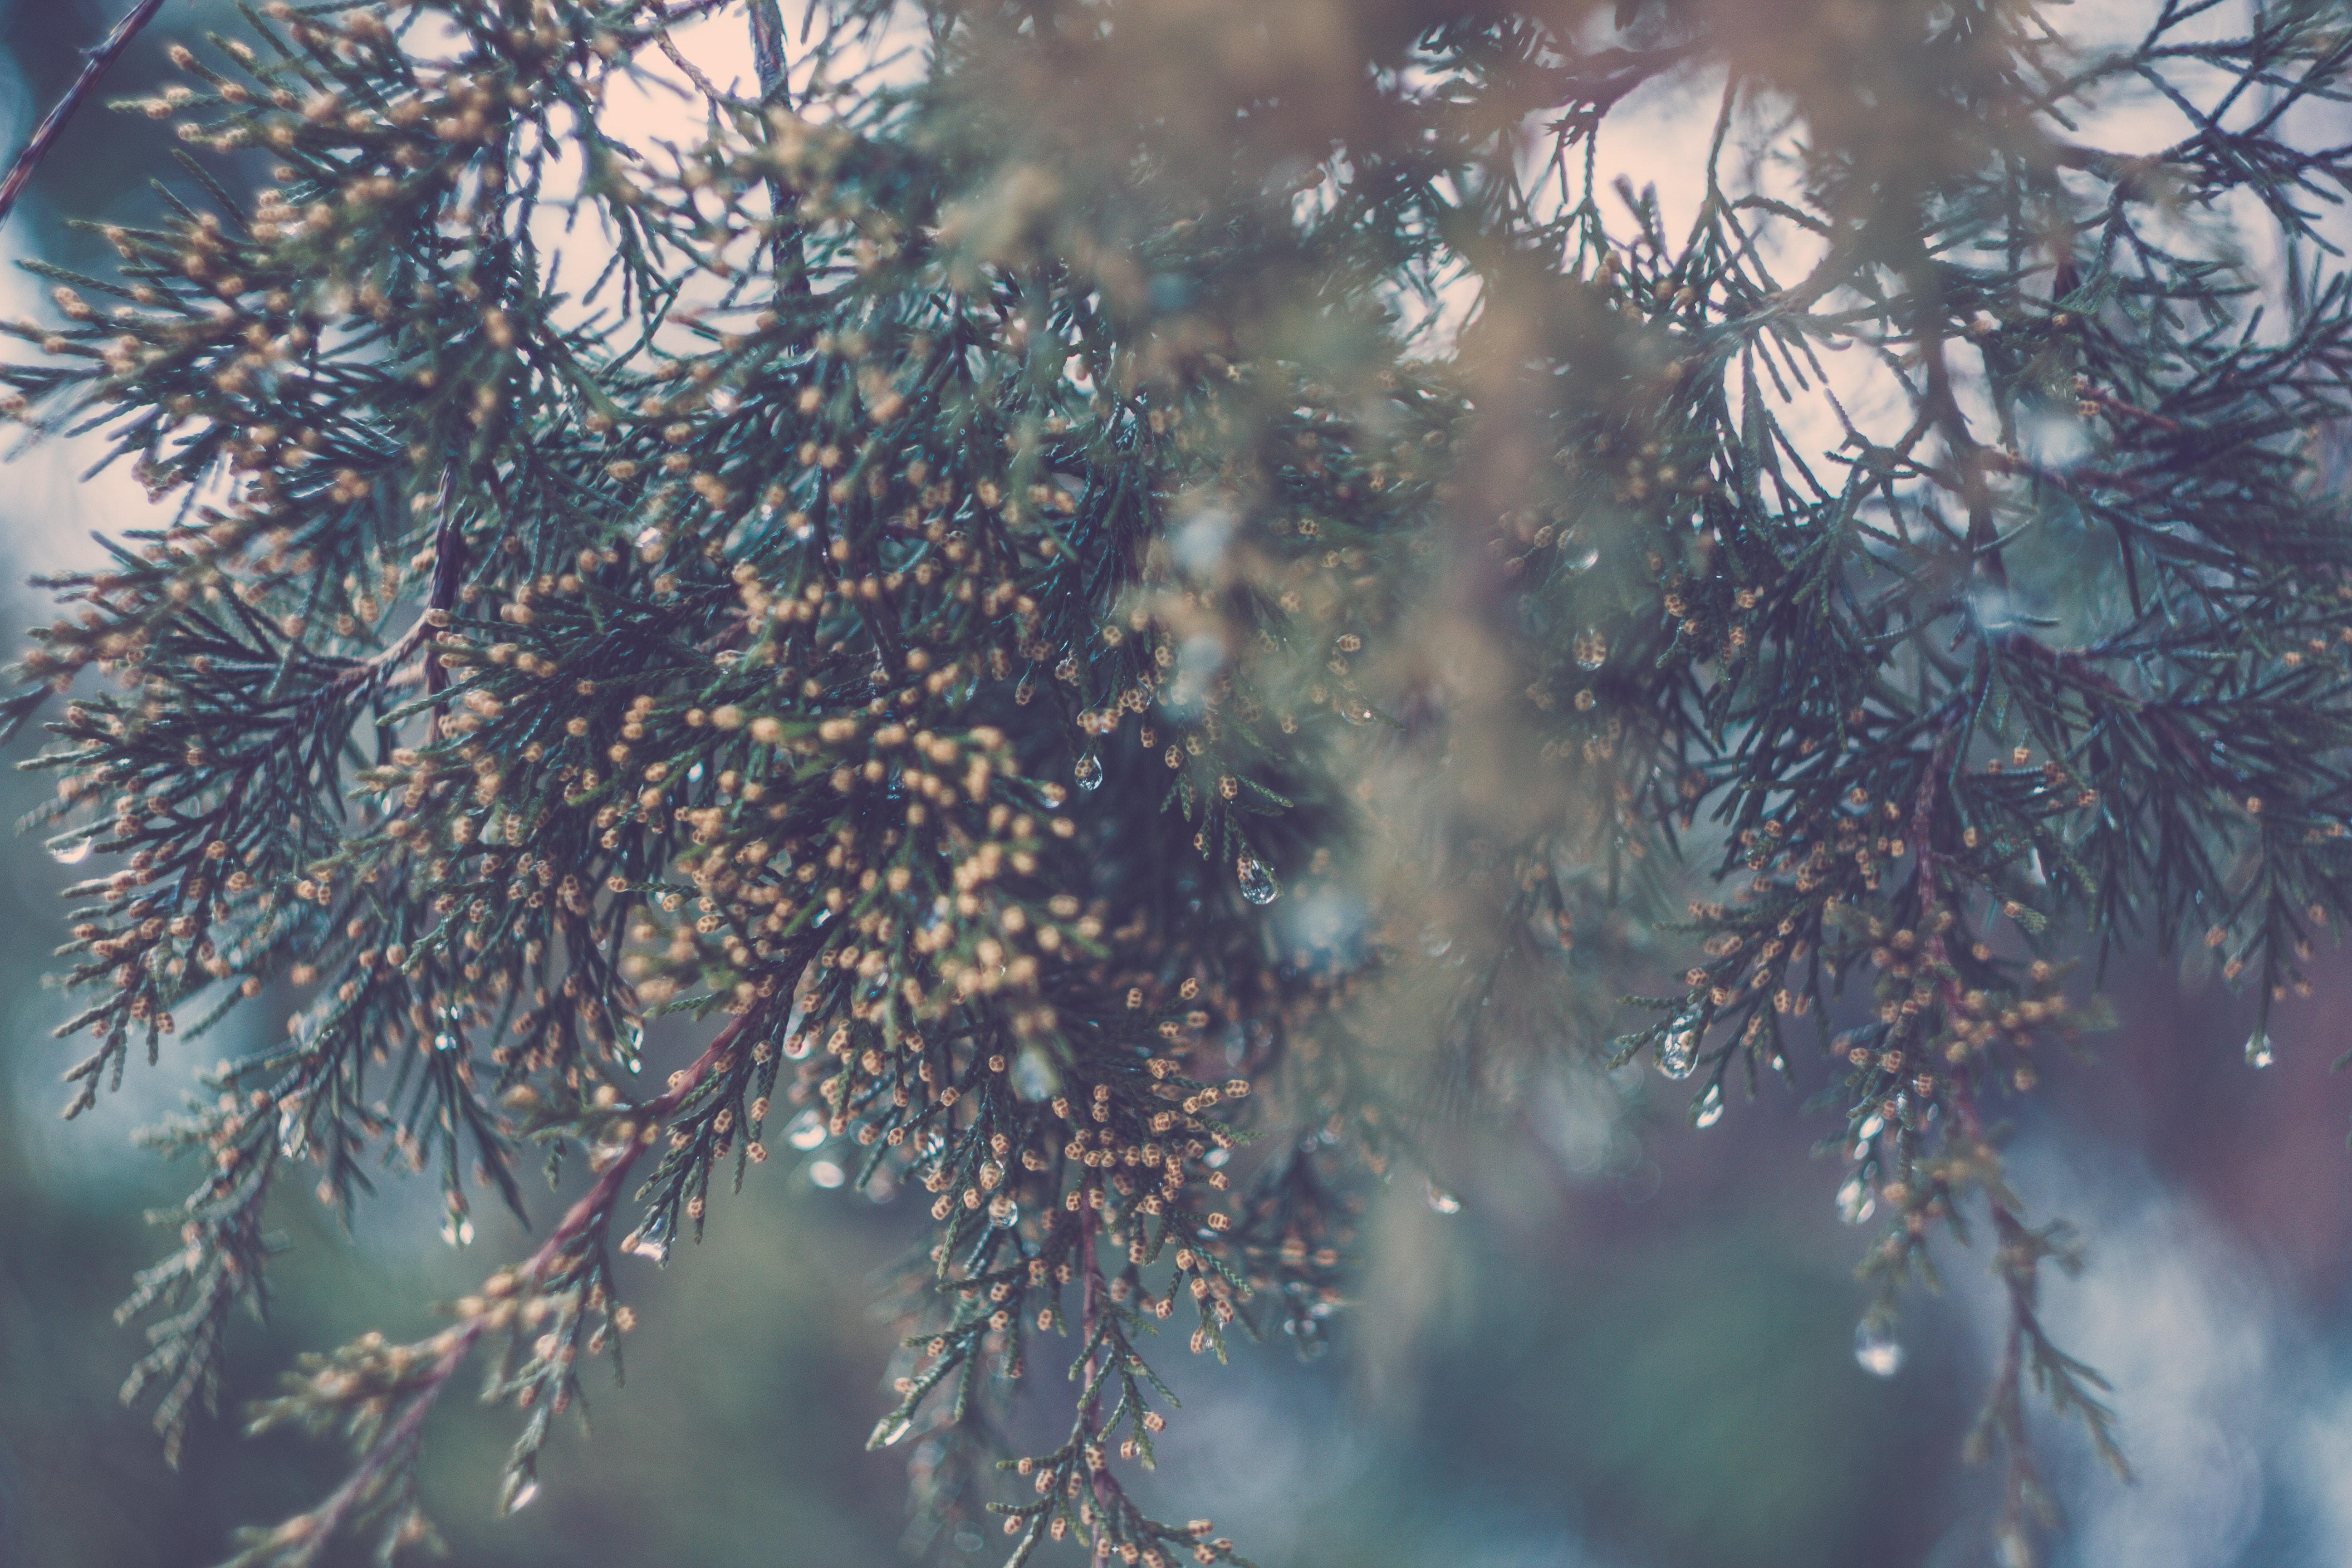 Green White and Yellow Christmas Ornament, Blur, Invertebrate, Tree, Spruce, HQ Photo